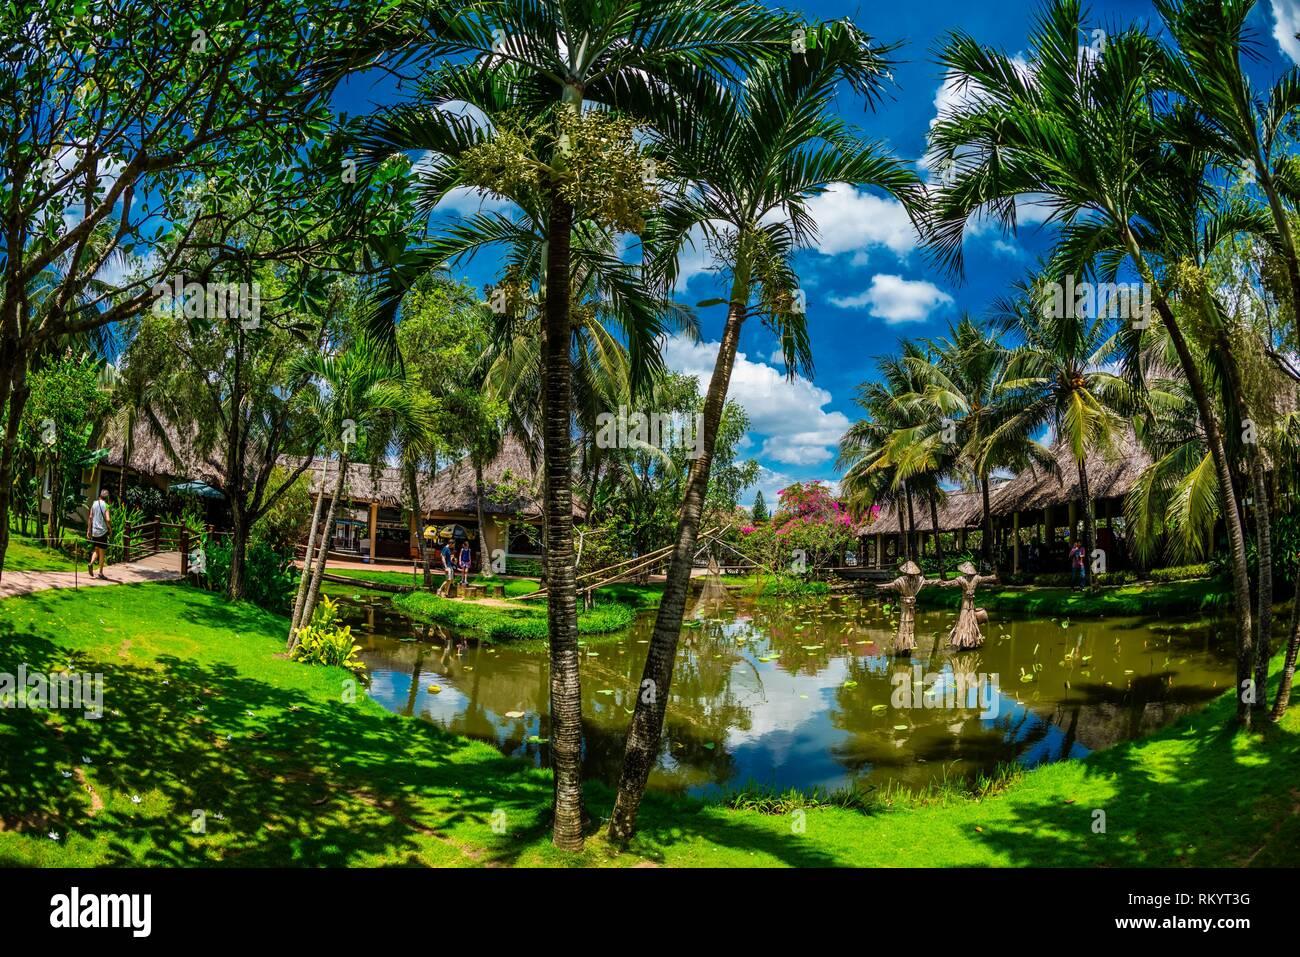 Mekong Rest Stop, Chau Thanh, Vietnam. - Stock Image